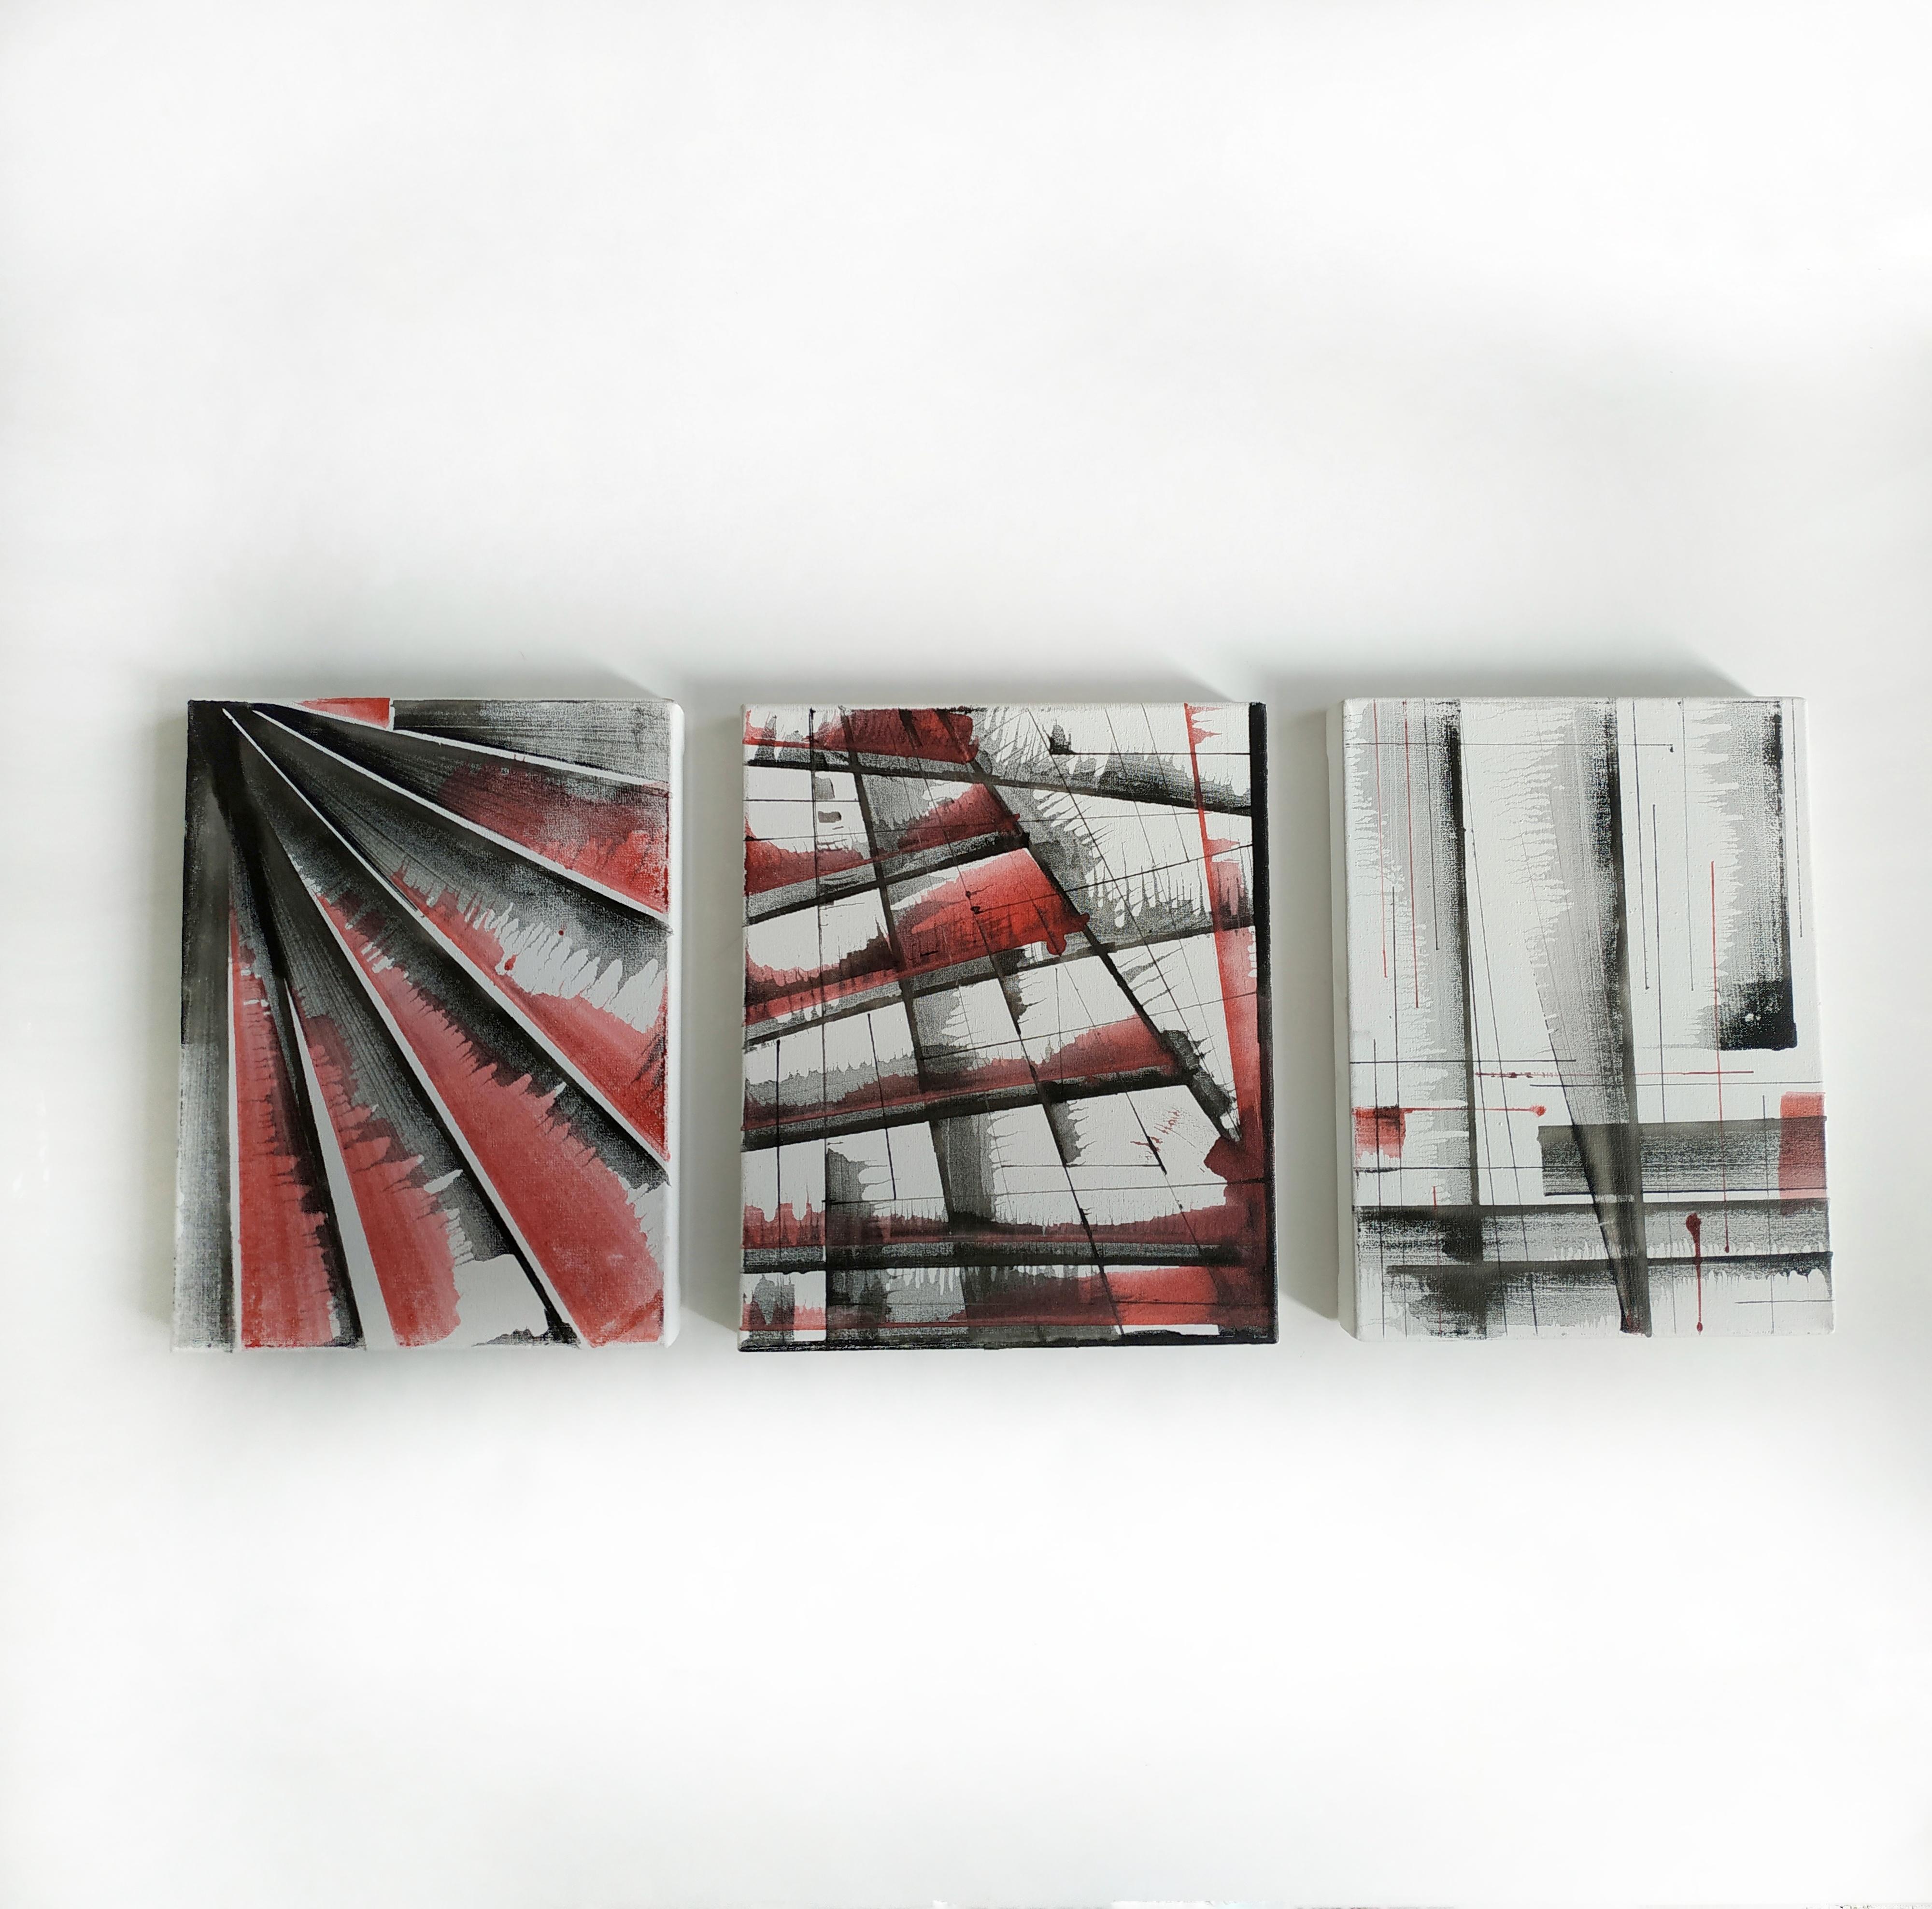 Триптих, 2019, чорнило, полотно,60*24 см